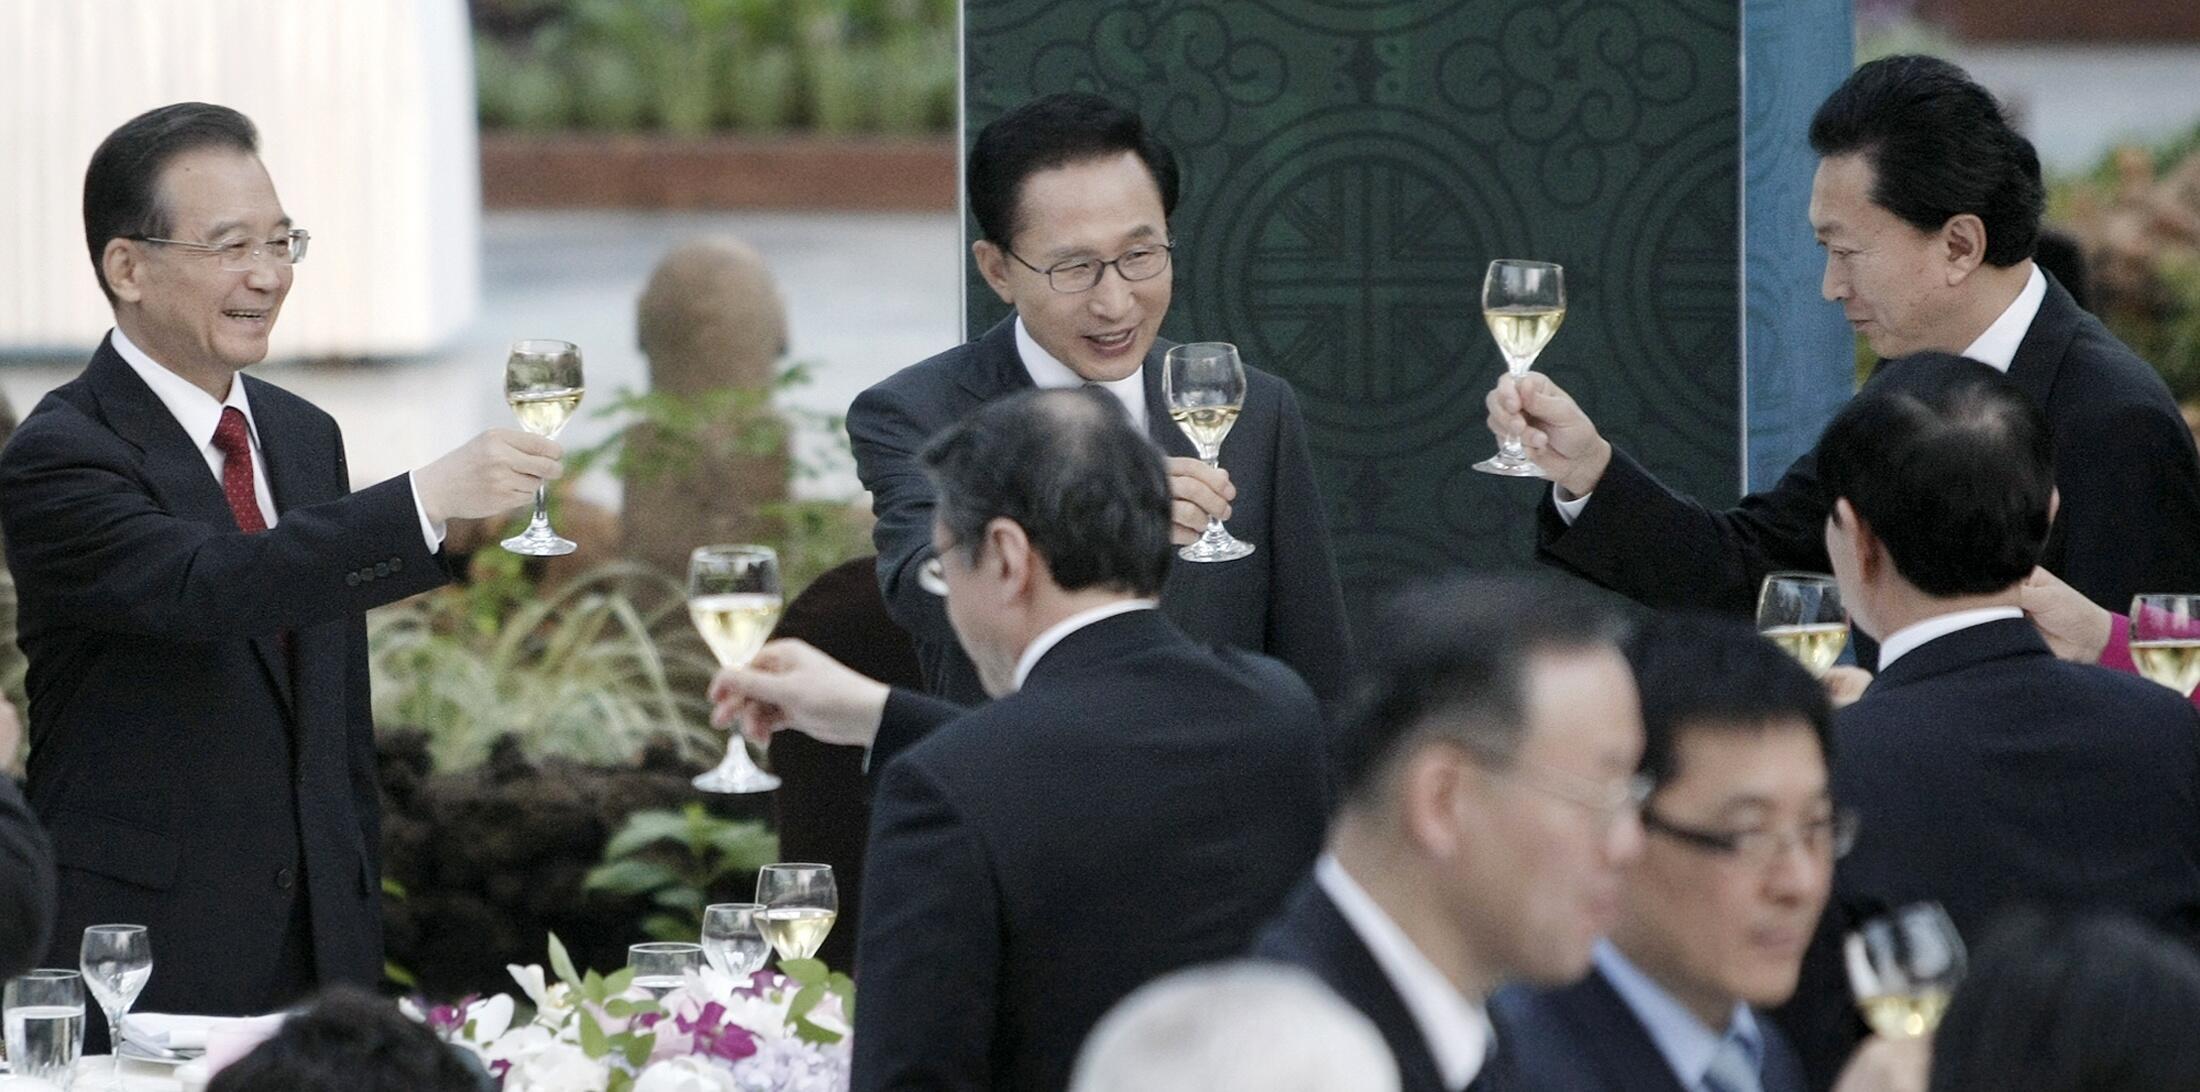 South Korean President Lee Myung-bak and Chinese PM Wen Jiabao in Seogwipo